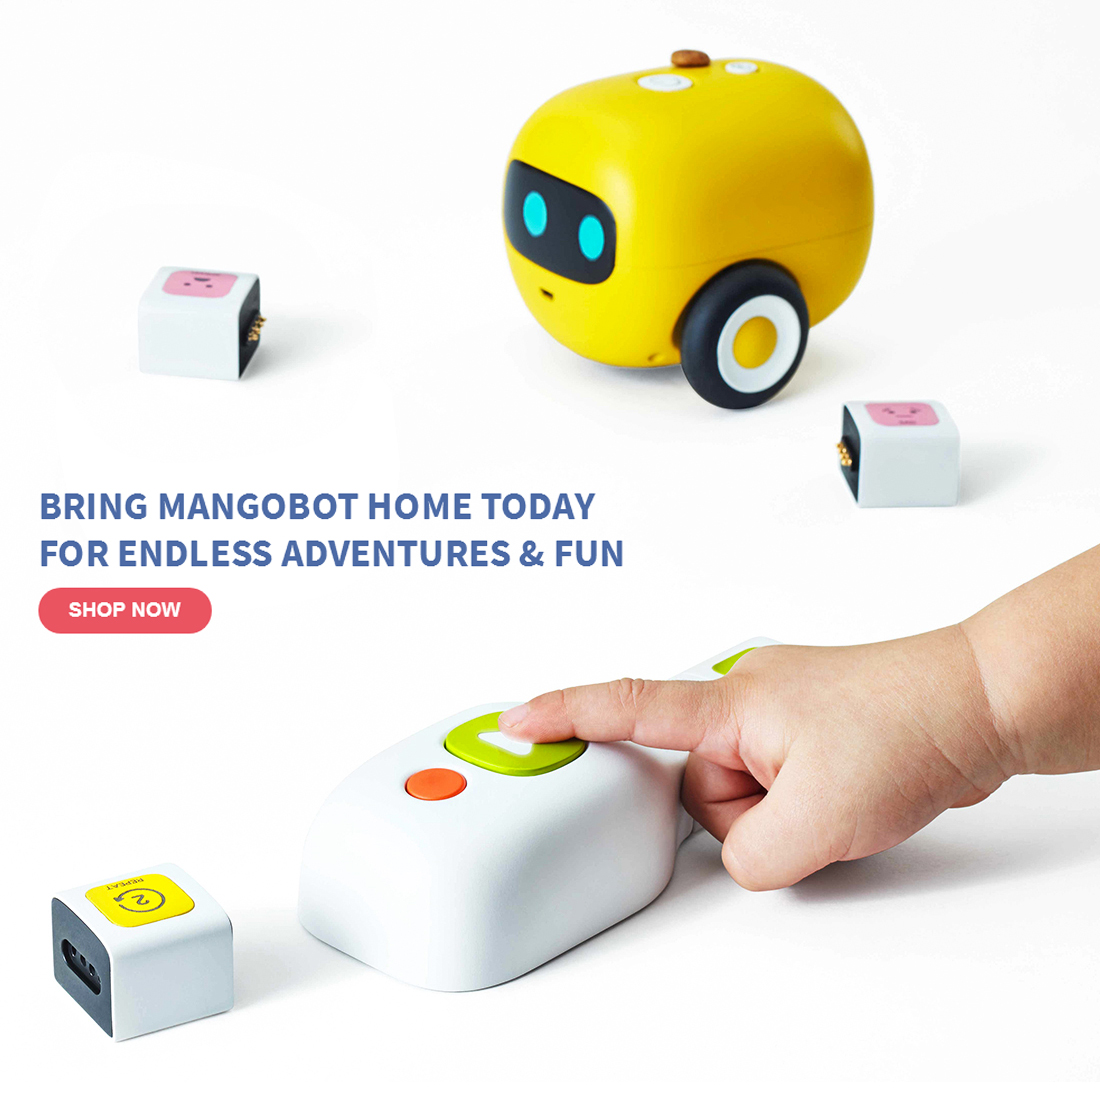 Mangobot Visual No Screen Programming Type Enlightenment Building Block Secretly Teaches Coding Steam Robot Toy For Children